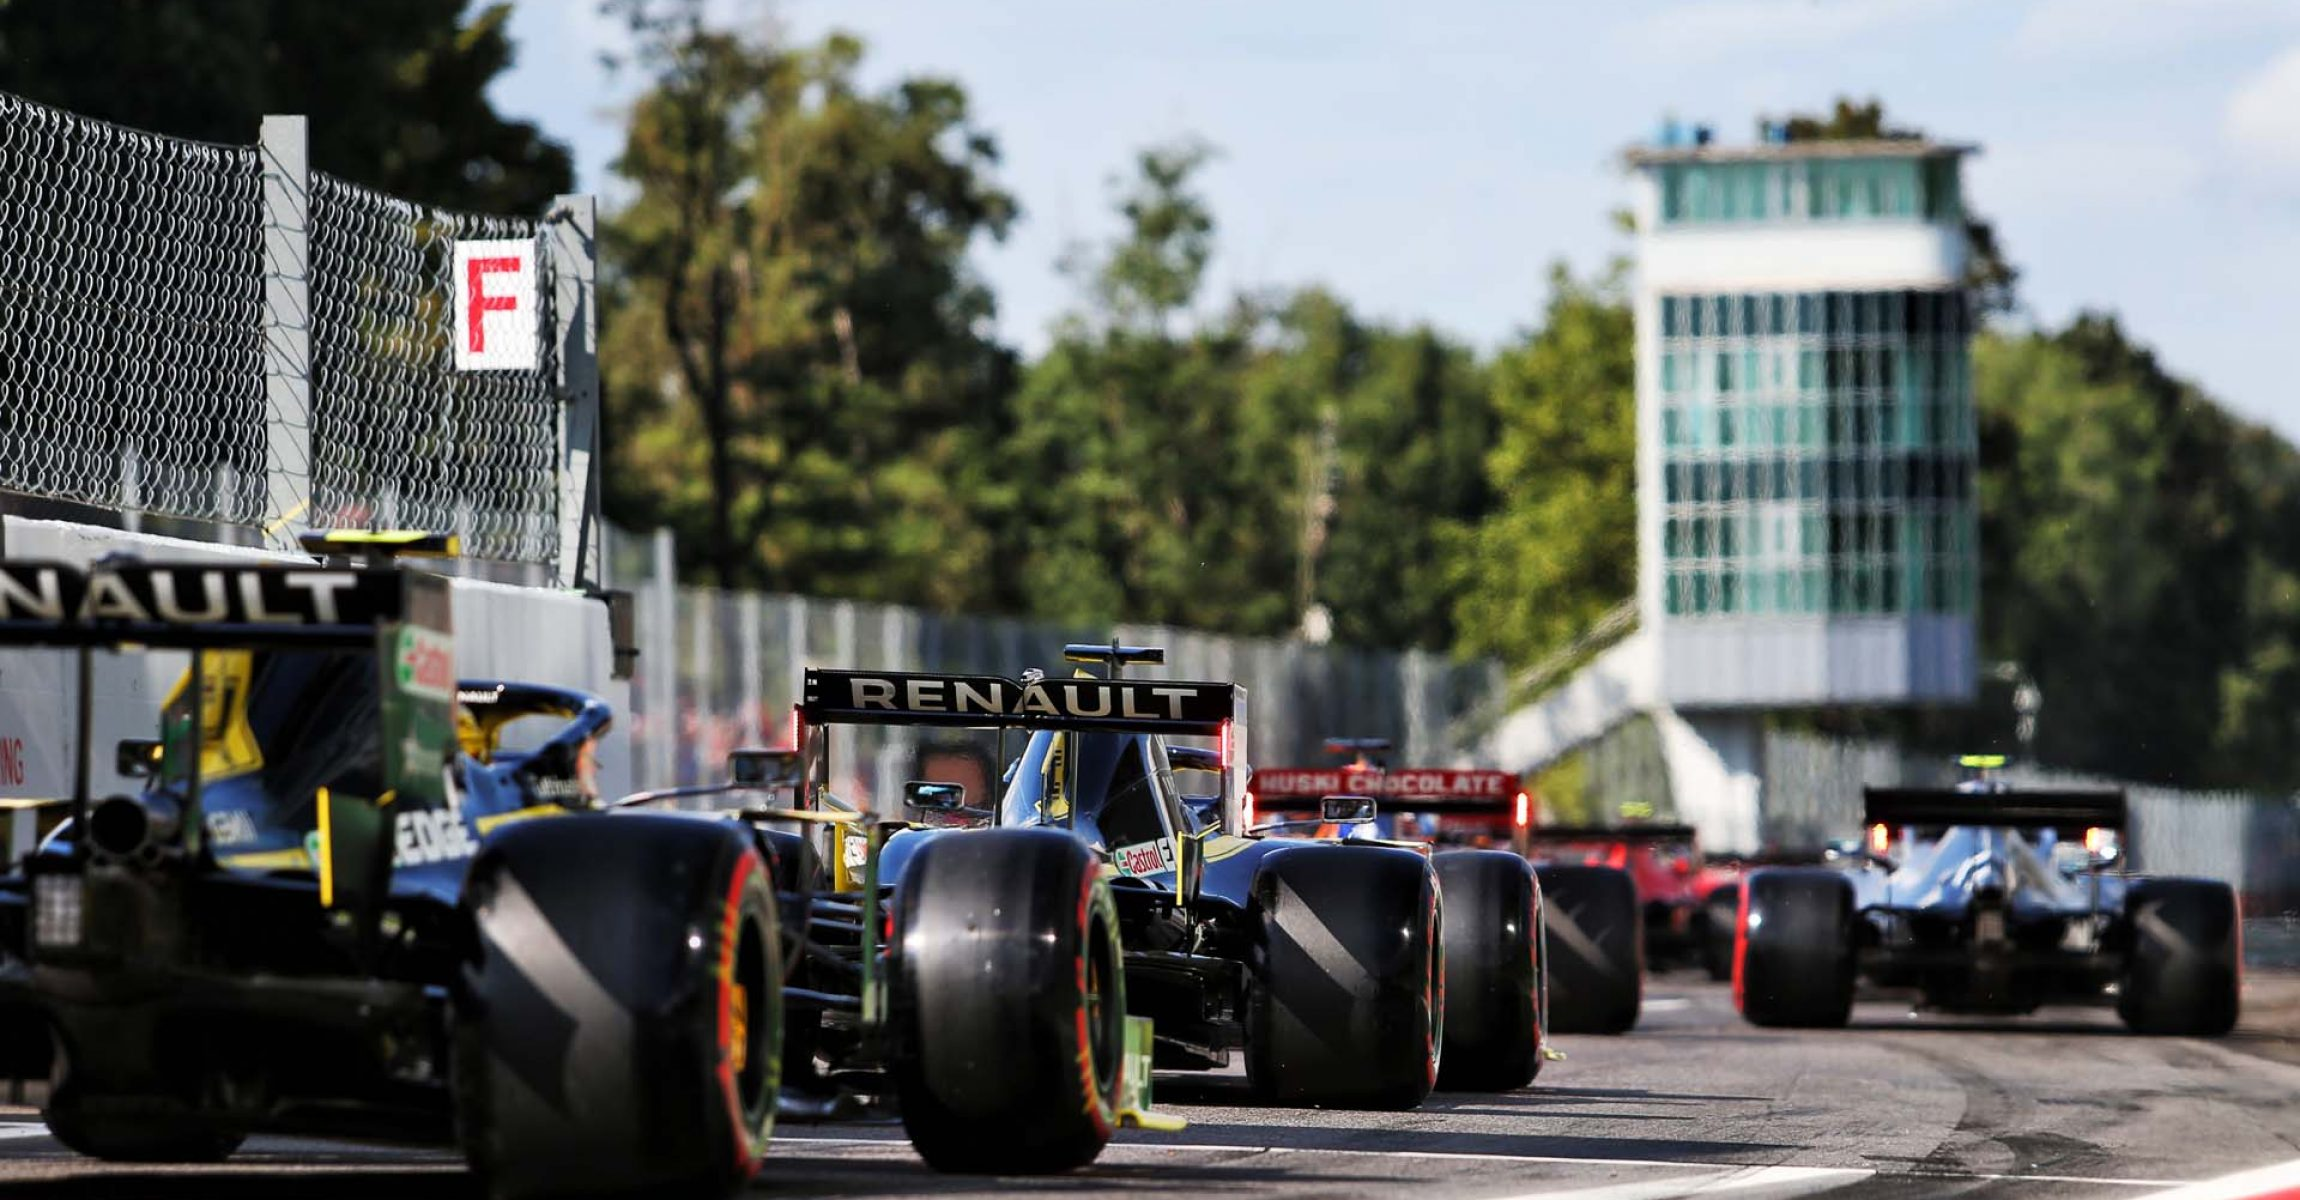 Daniel Ricciardo (AUS) Renault F1 Team RS19 and Nico Hulkenberg (GER) Renault F1 Team RS19. Italian Grand Prix, Saturday 7th September 2019. Monza Italy.